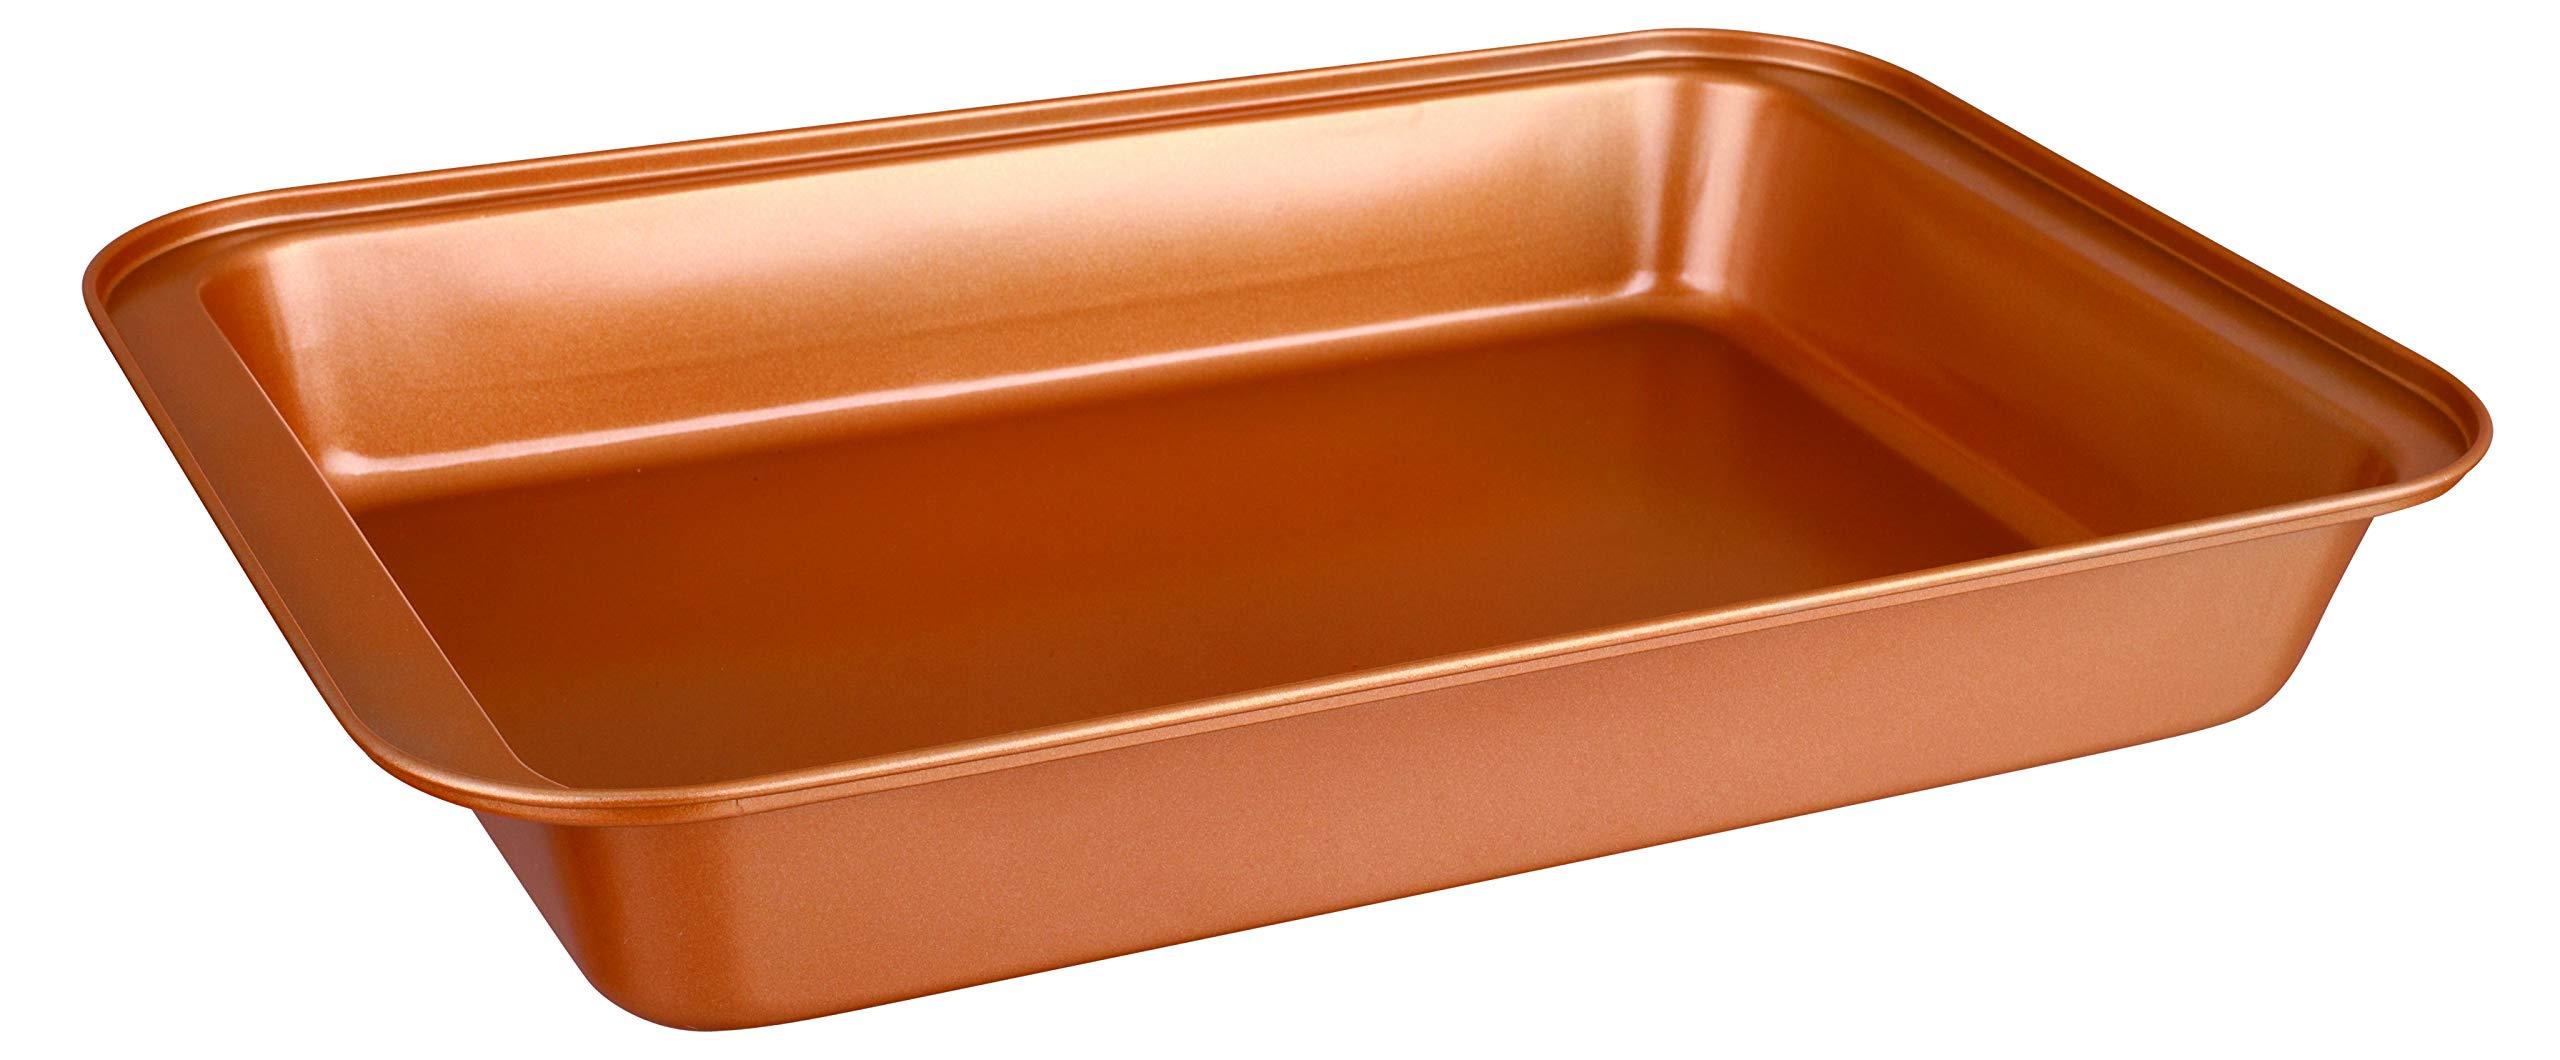 CopperKitchen Baking Pans - 3 pcs Toxic Free NONSTICK - Organic Environmental Friendly Premium Coating - Durable Quality - Rectangle Pan, Cookie Sheet - BAKEWARE SET (3) by CopperKitchenUSA (Image #8)